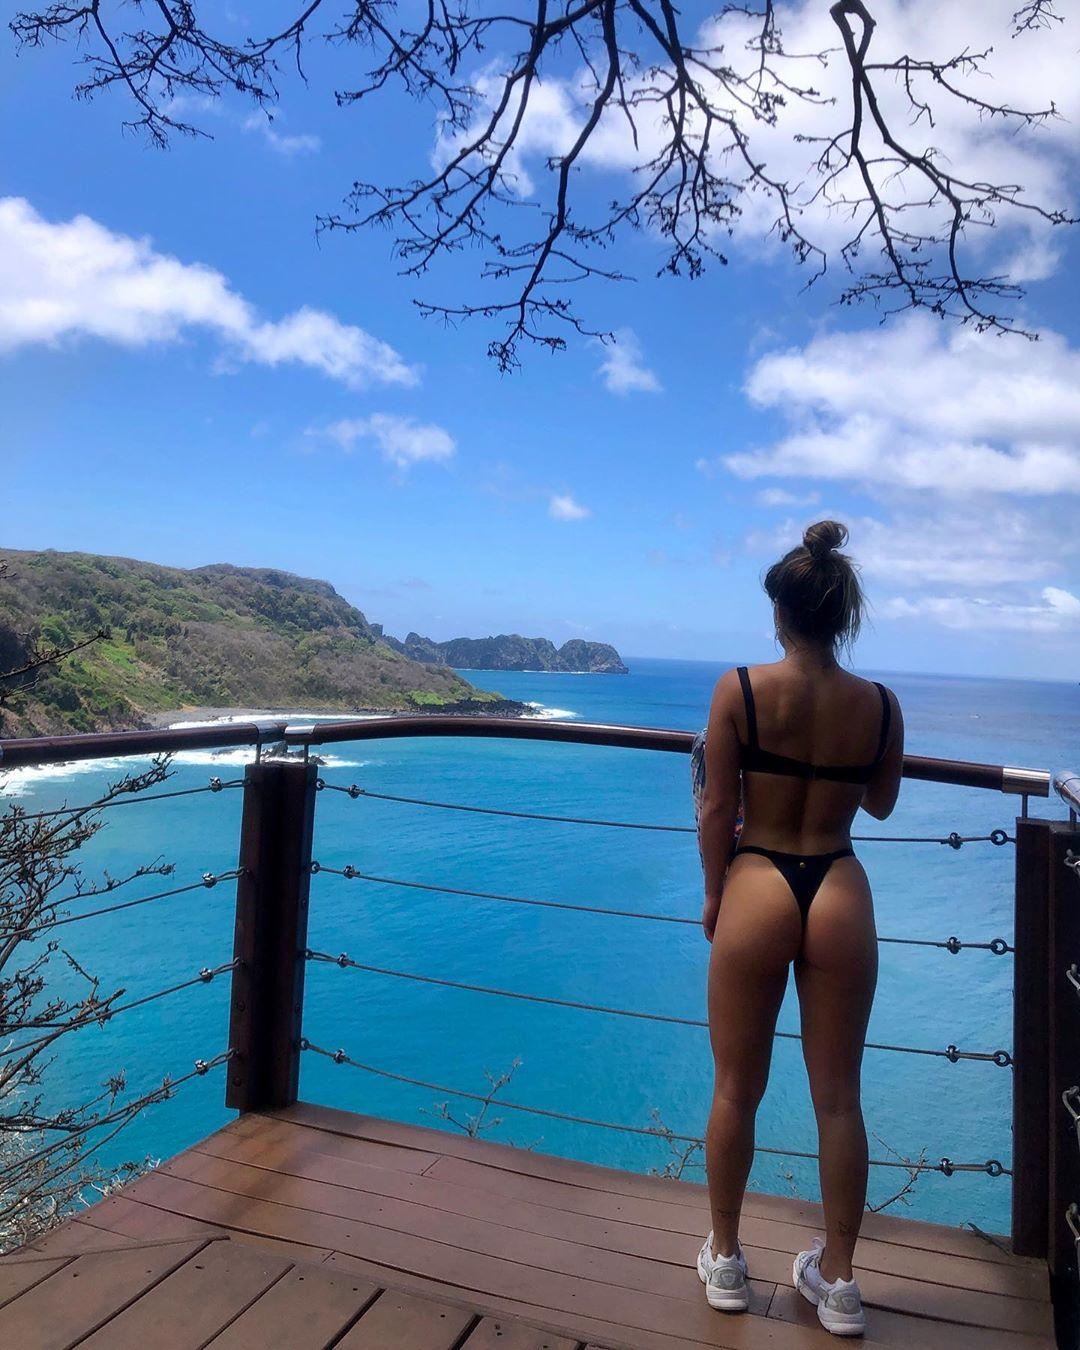 Bruna Griphao mostra curvas ao posar de costas